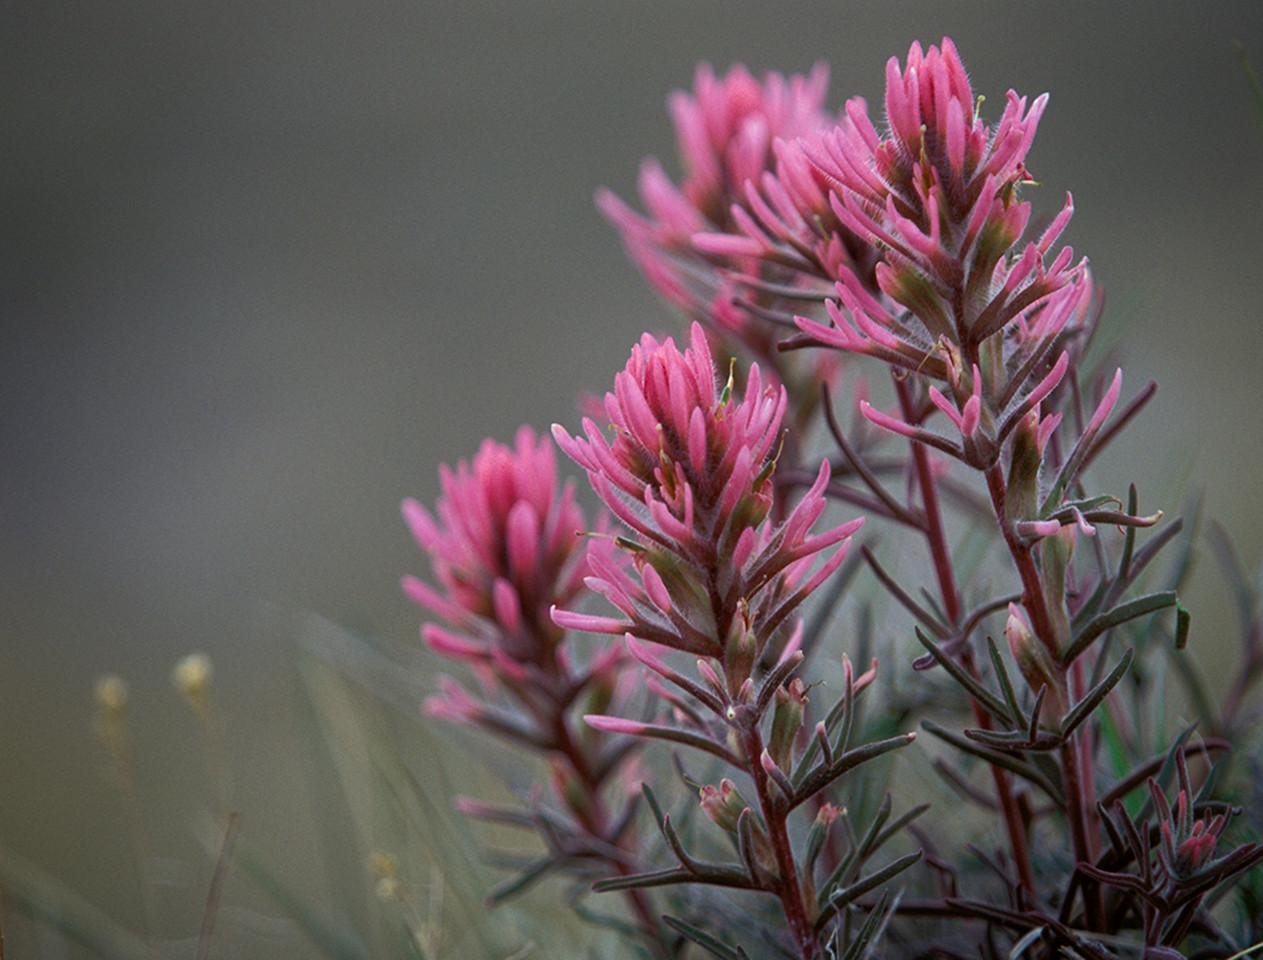 Jim_Parrish-DownyPaintbrush_Castilleja_sessiliflora